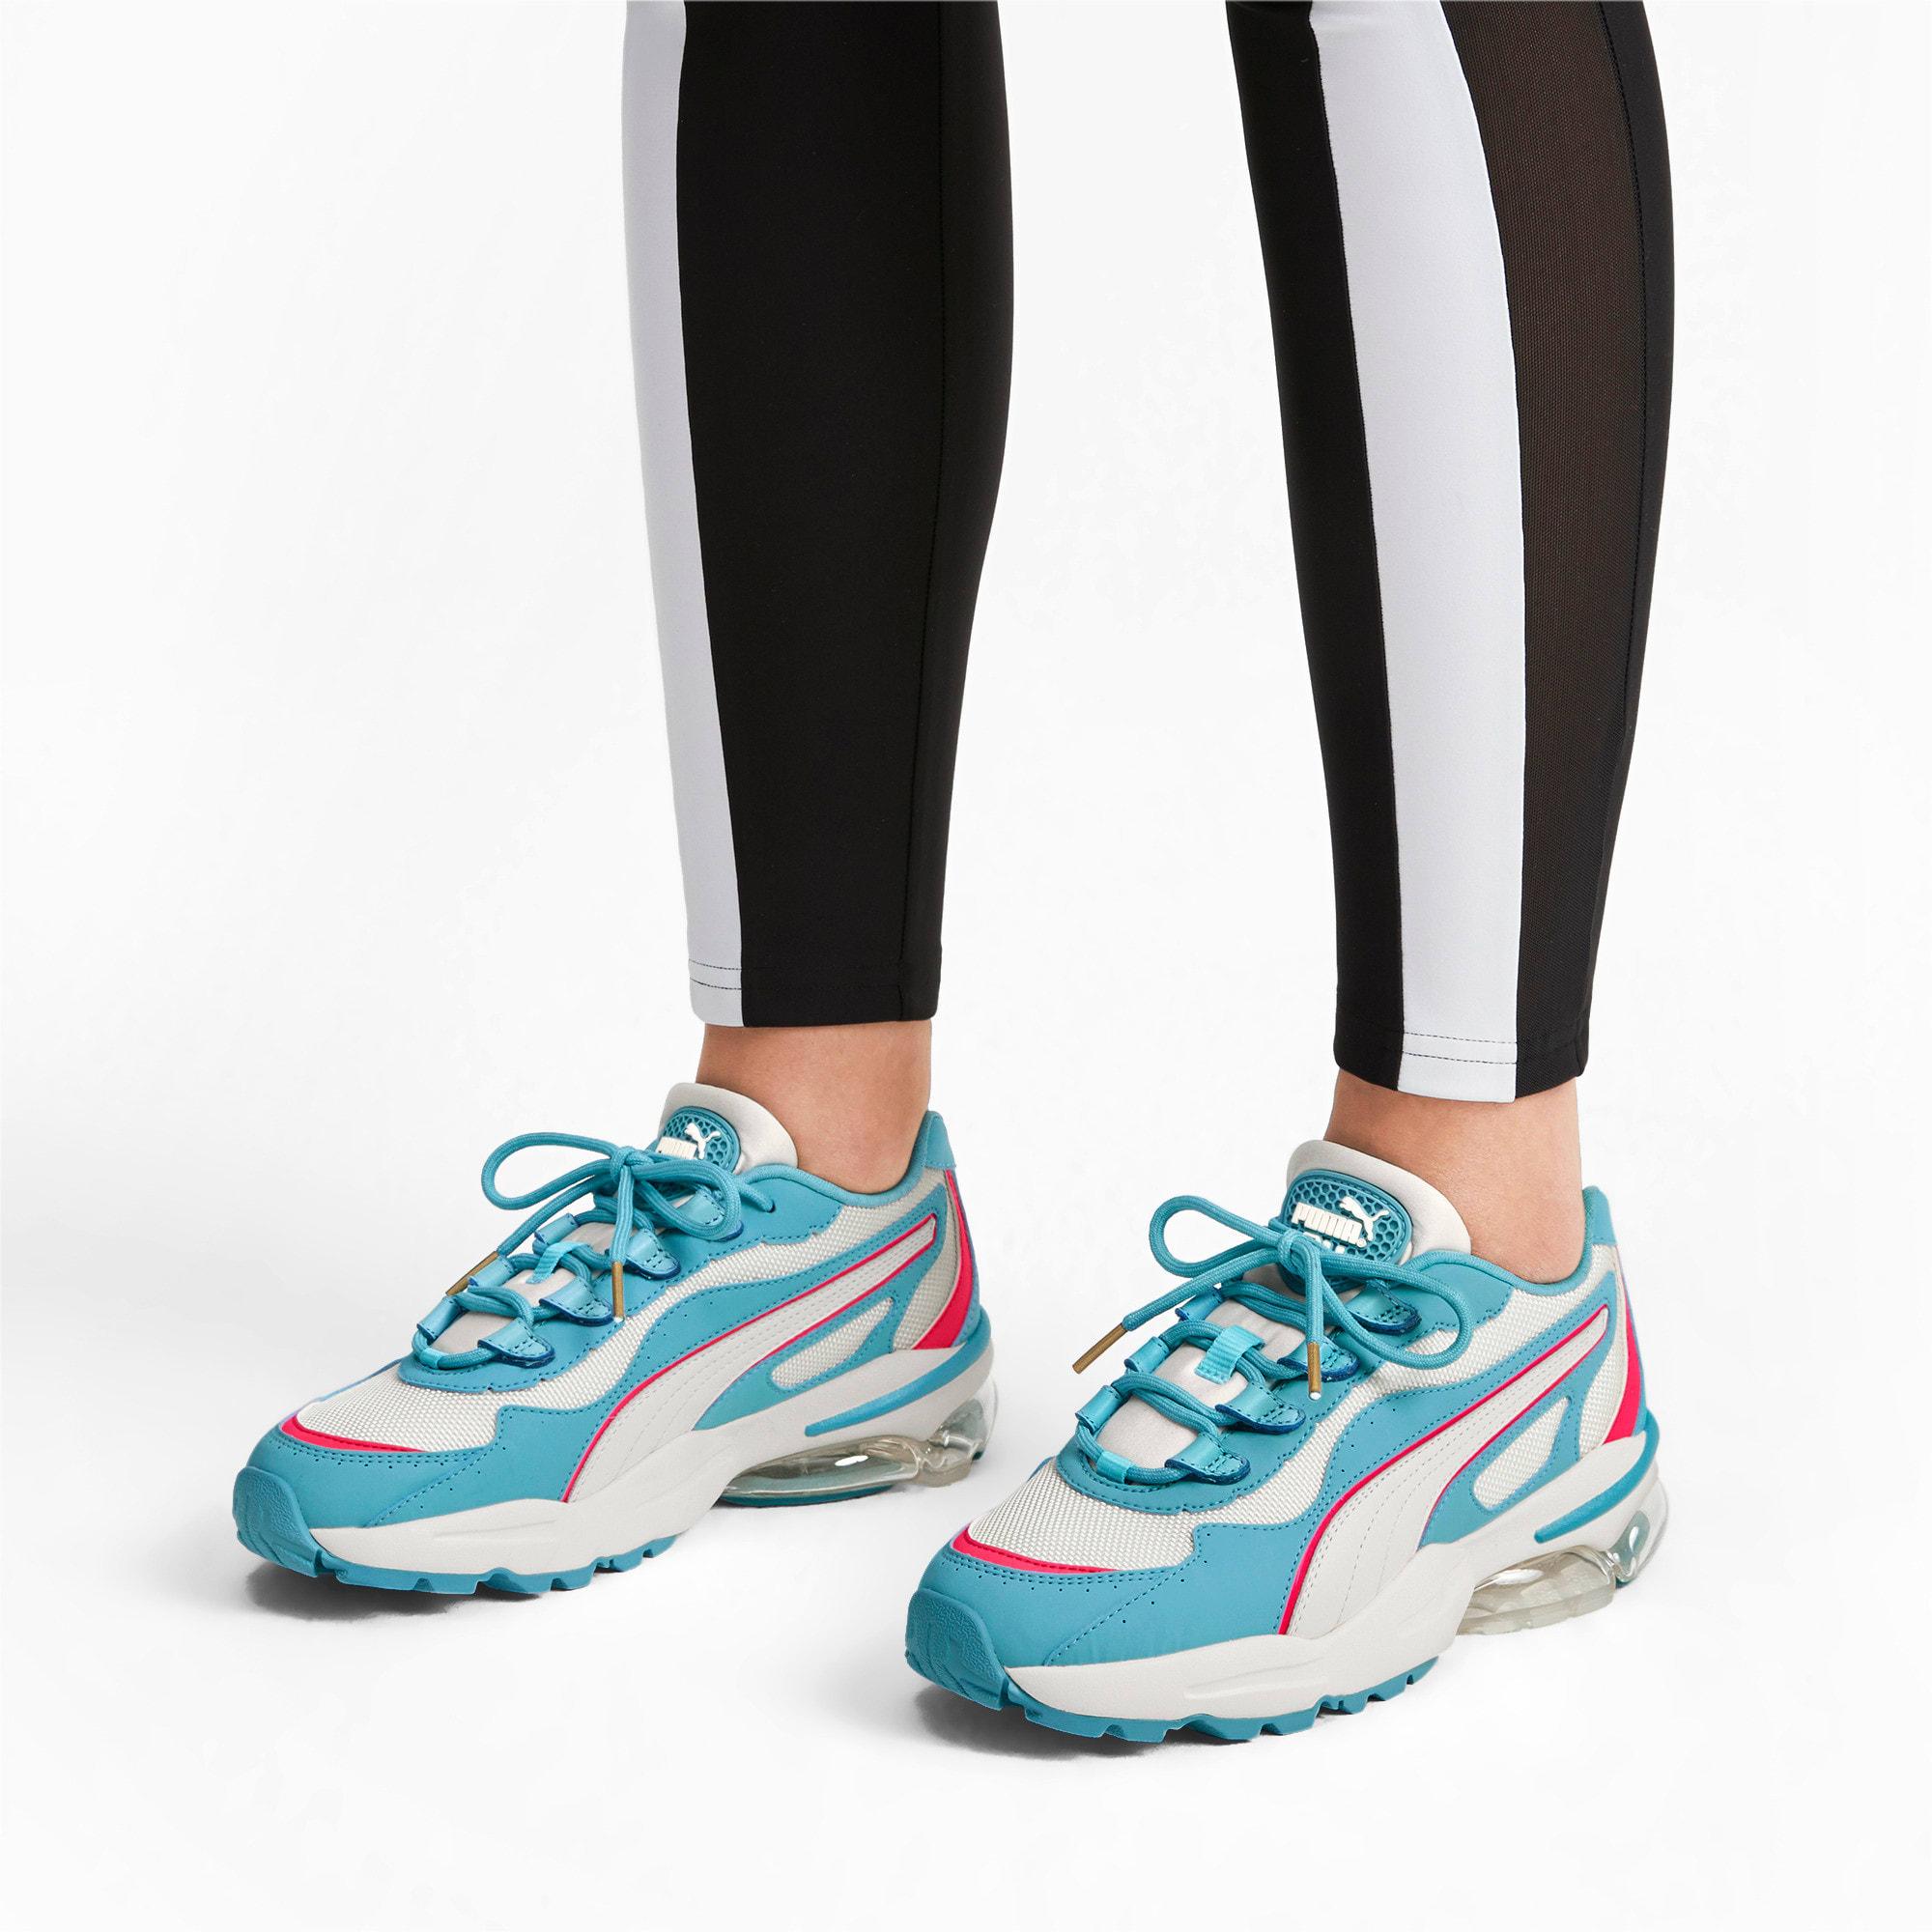 Miniatura 2 de Zapatos deportivos CELL Stellar para mujer, Milky Blue-Puma Team Gold, mediano